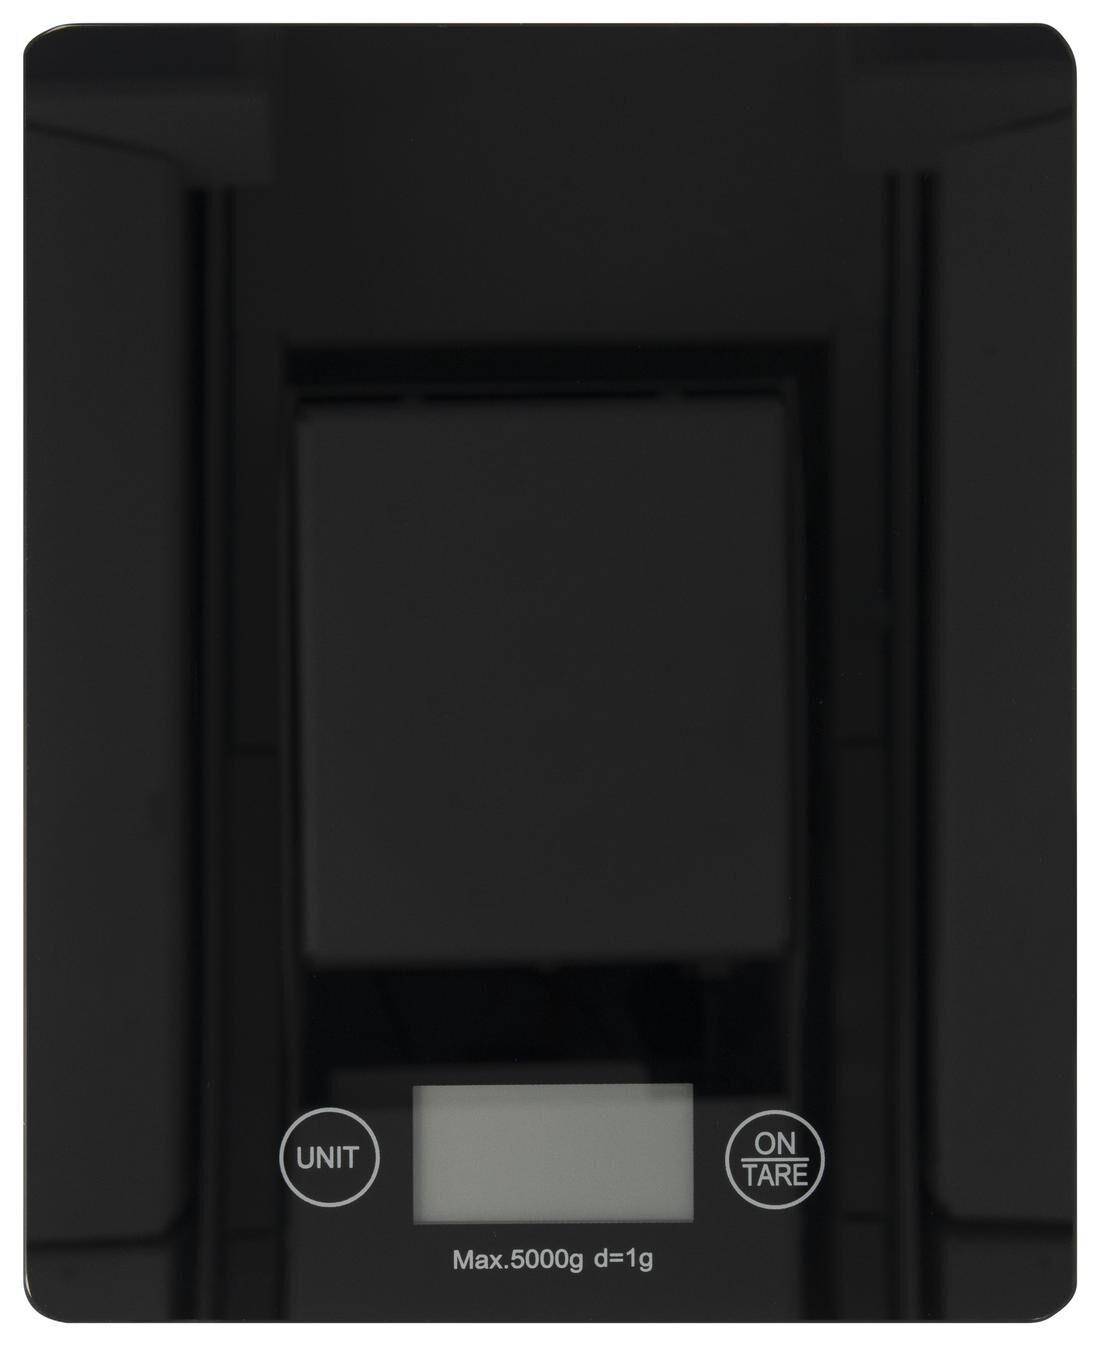 HEMA Digitale Keukenweegschaal (zwart)